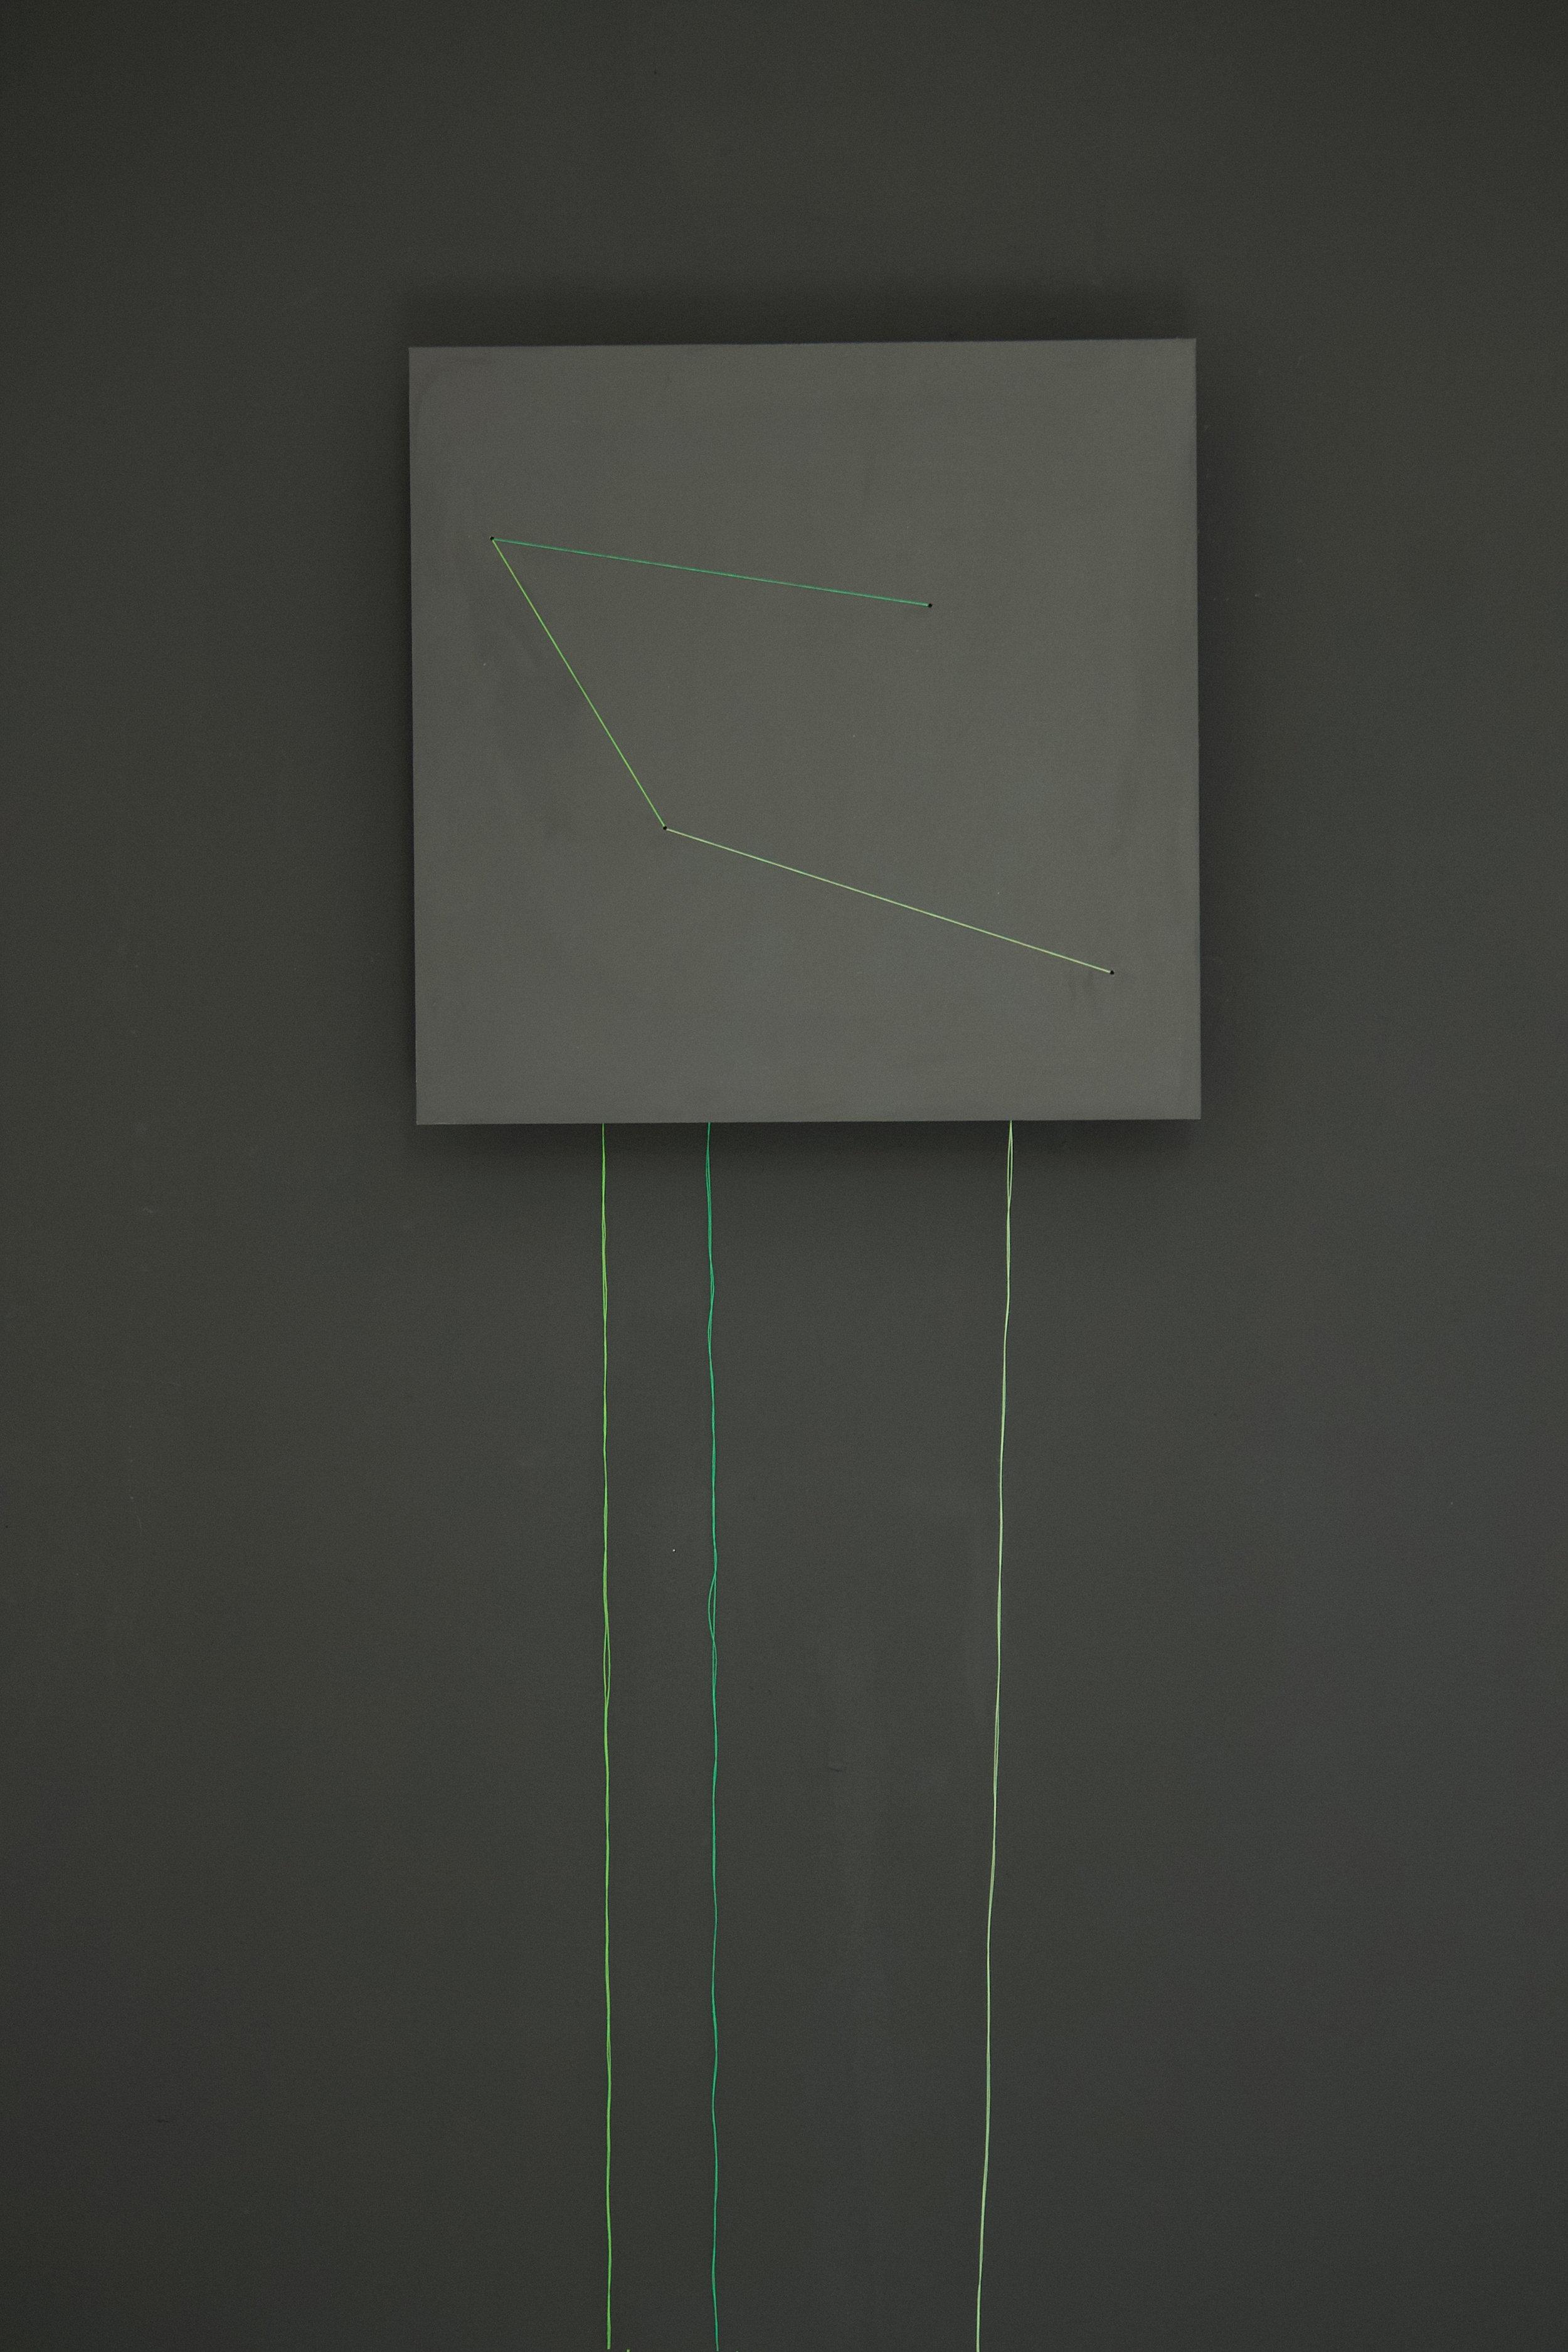 Green Edge, 2018